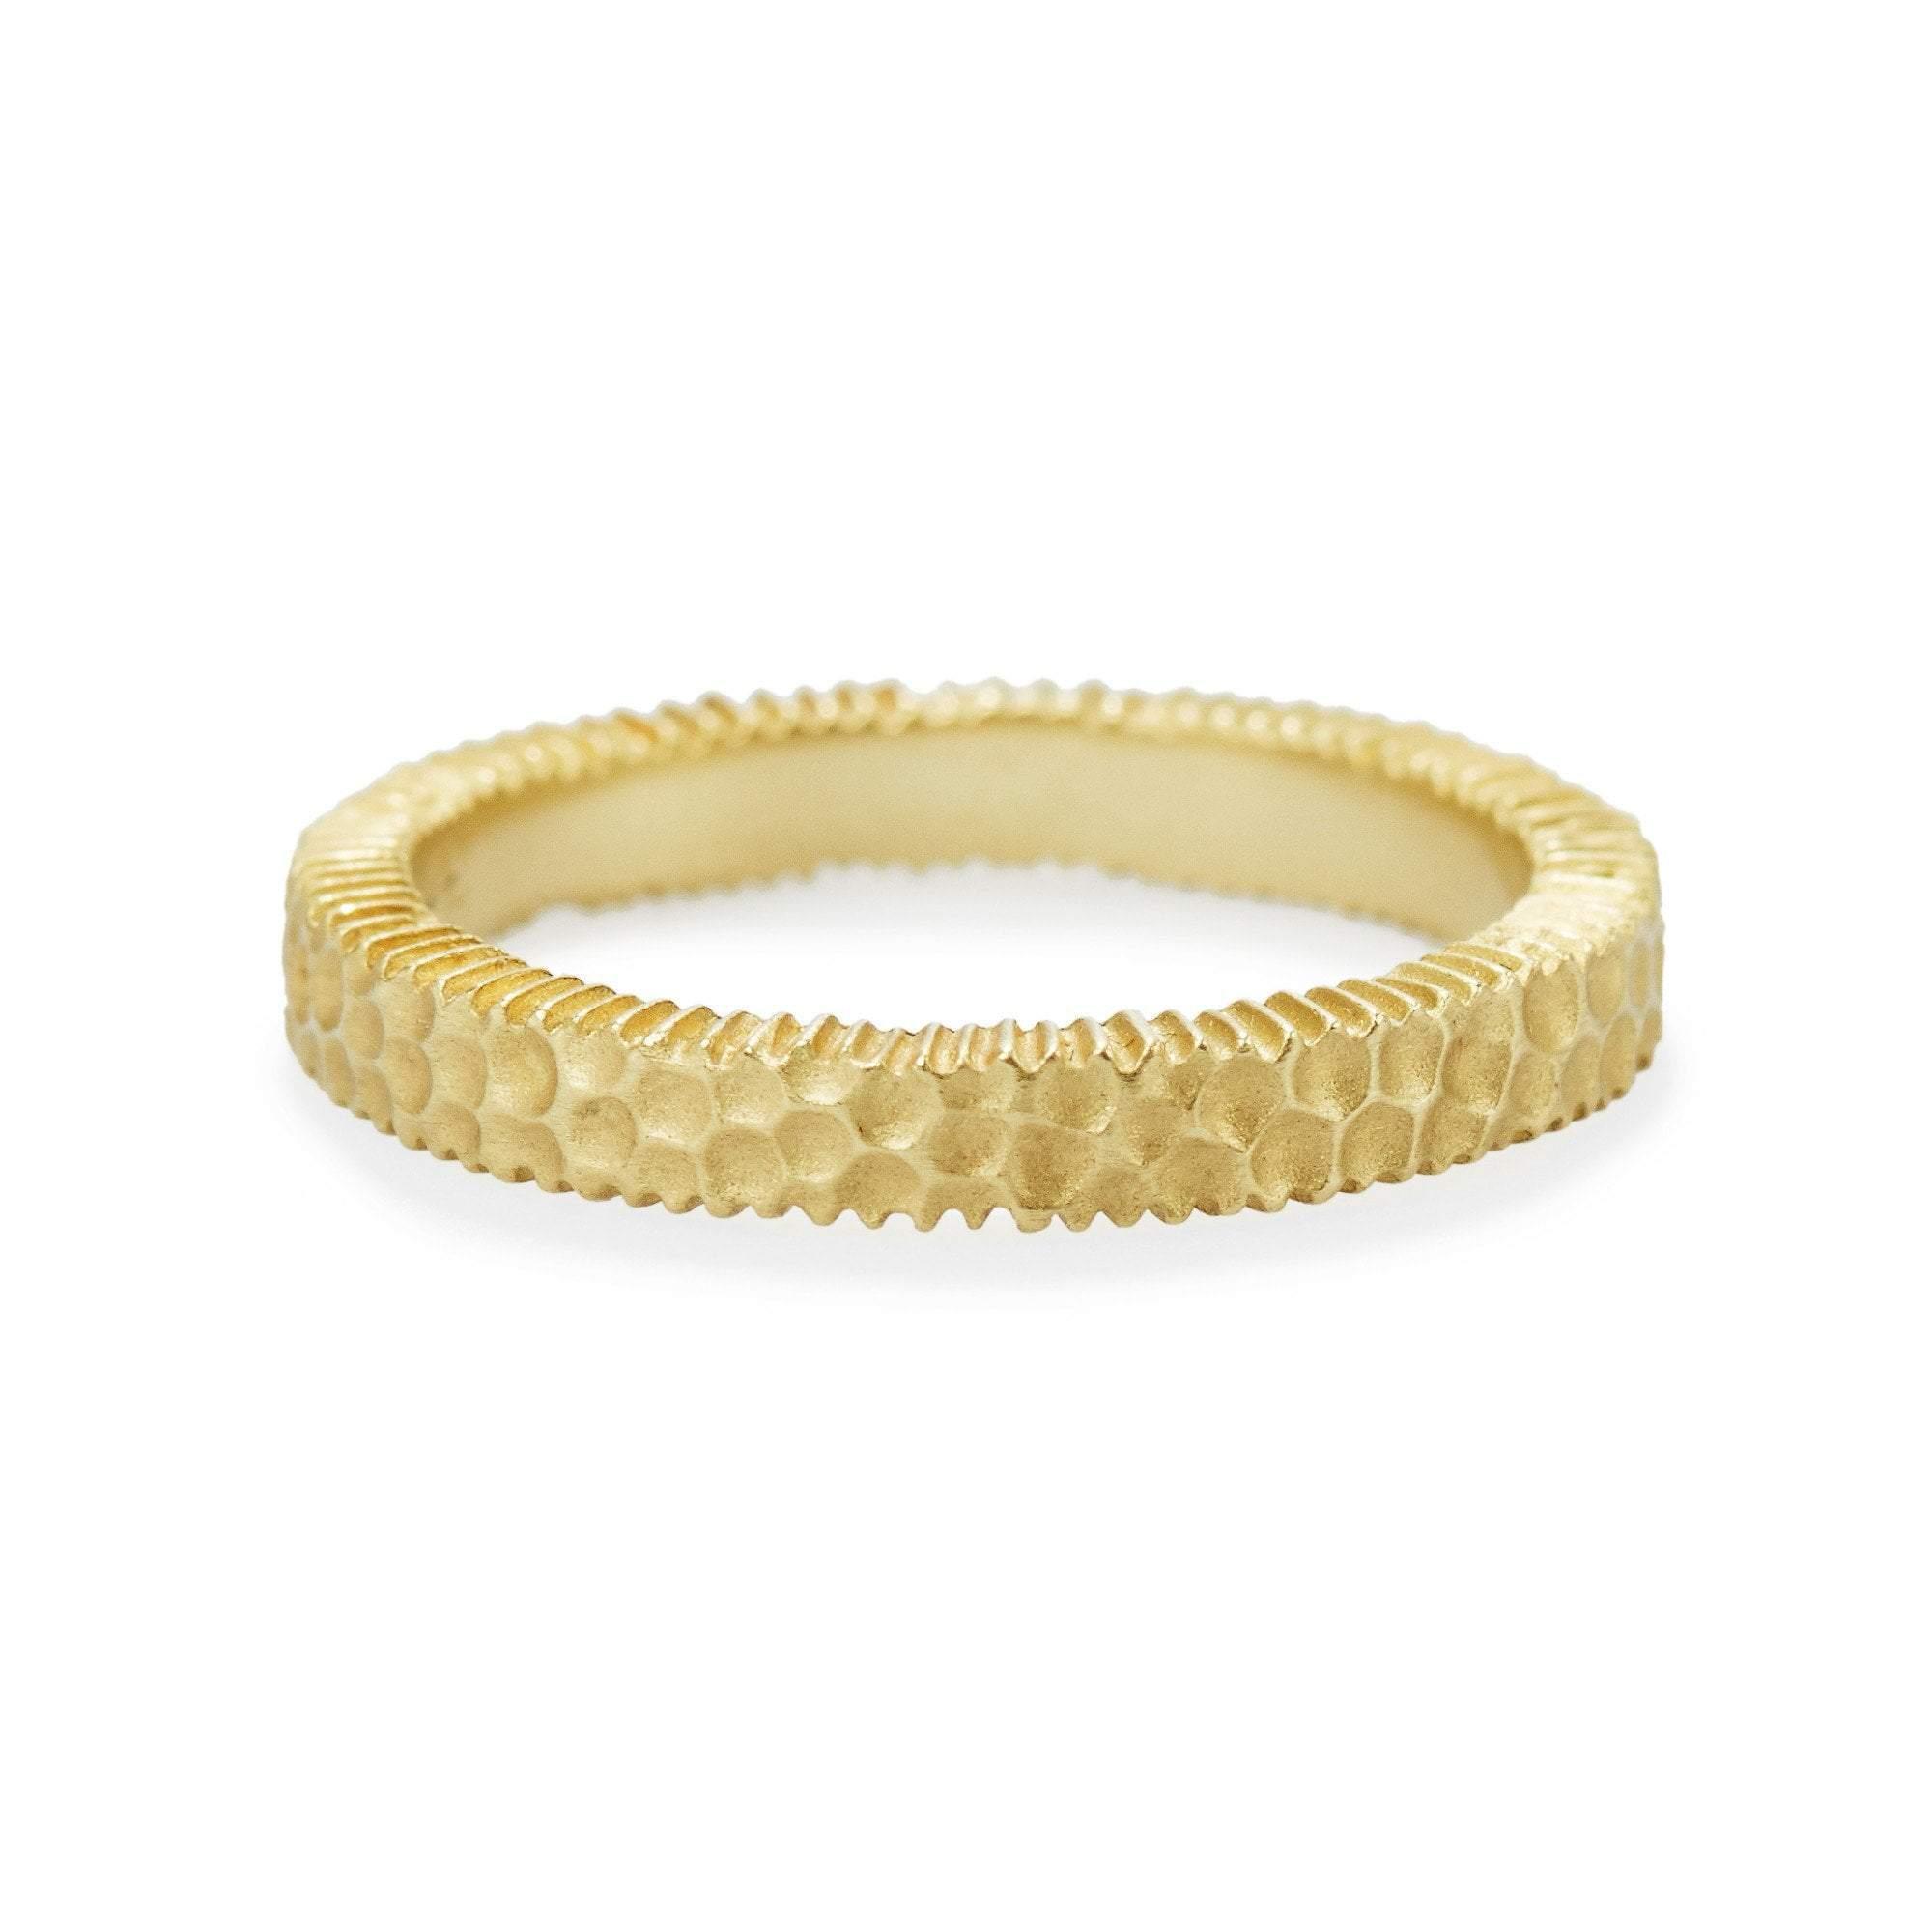 Elizabeth Buenaventura - Hammered Harmoy Ring